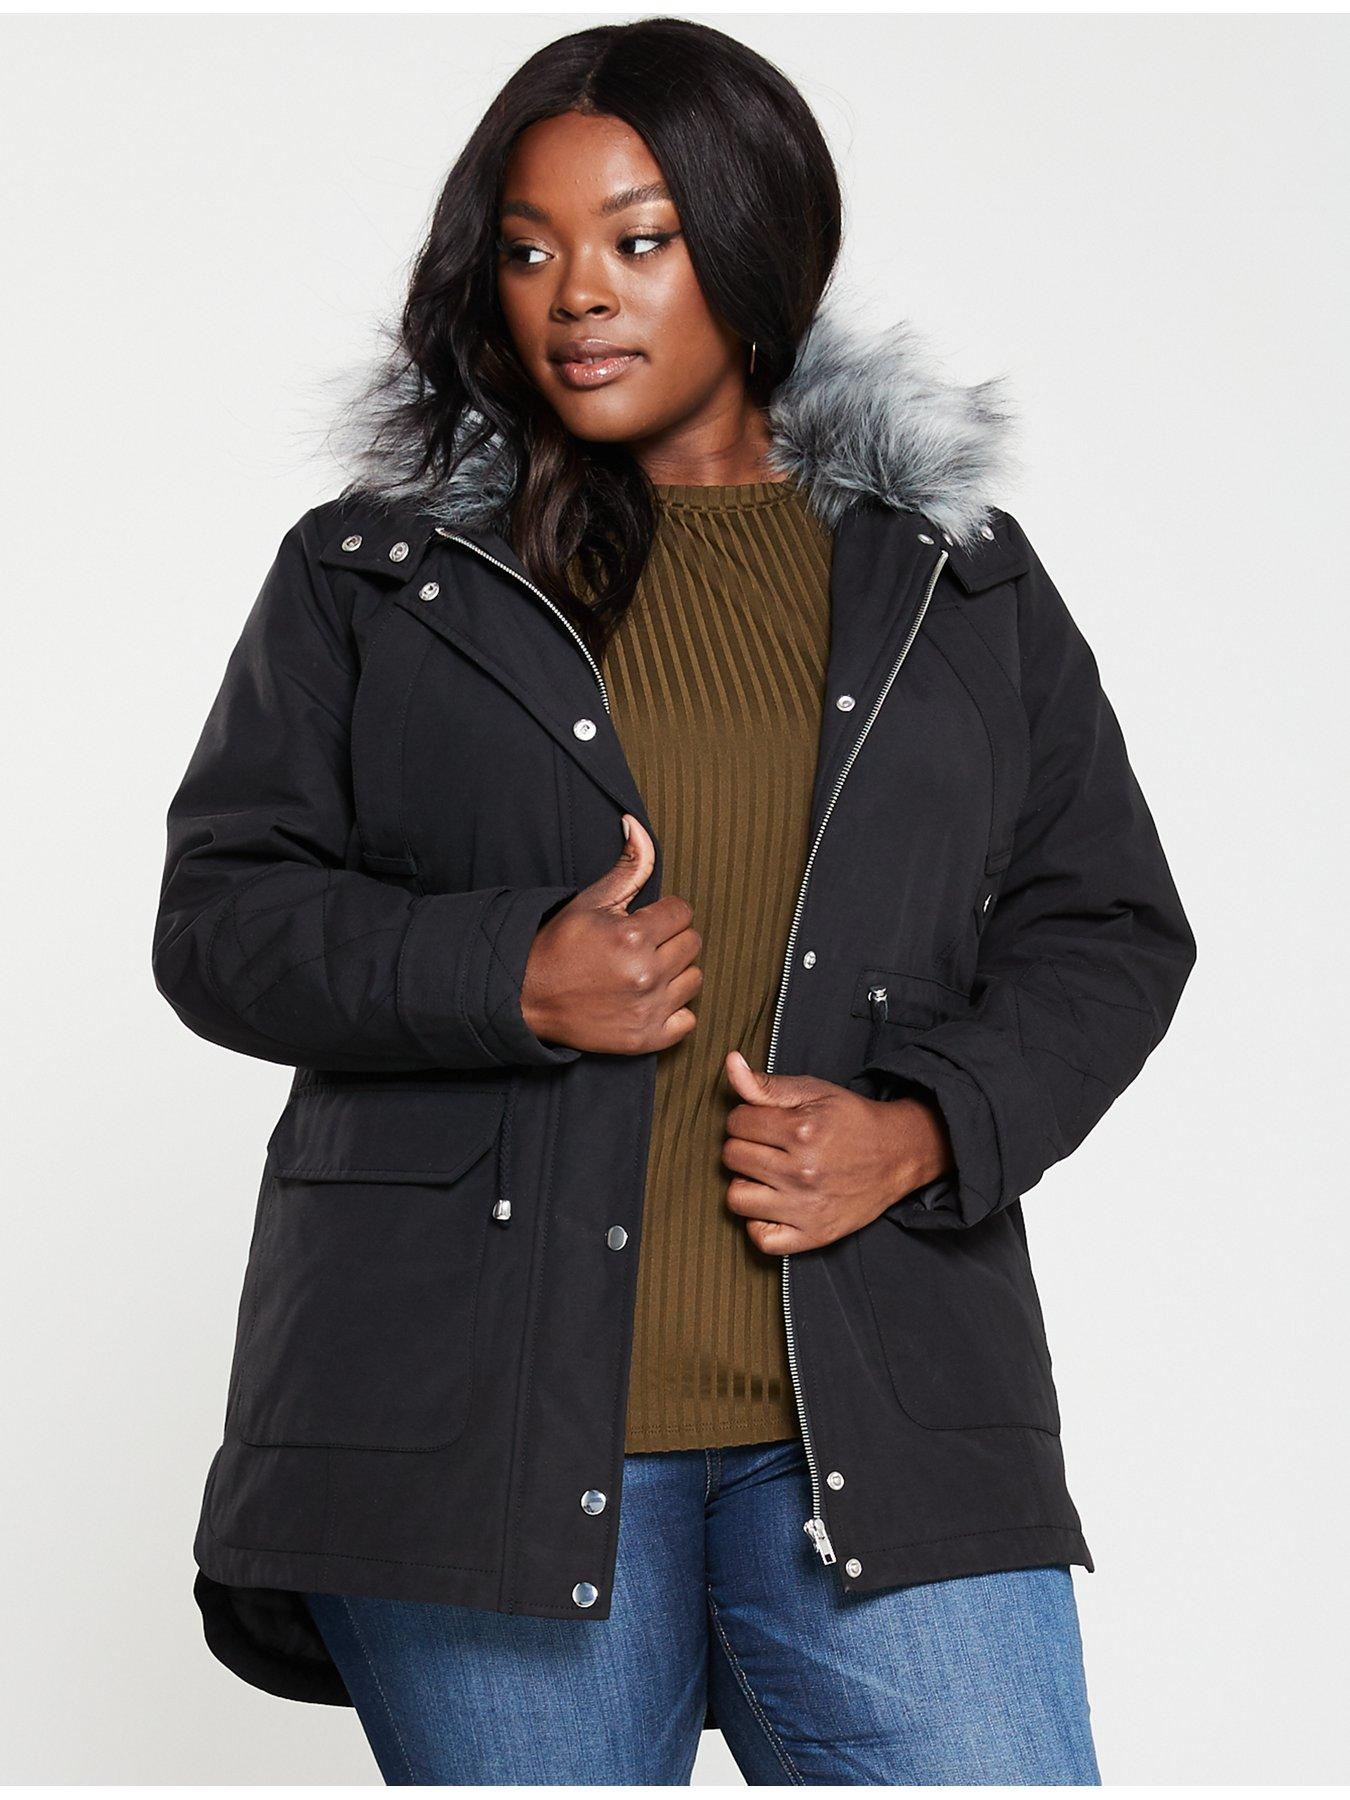 Size 14 Womens Black Parka Coat Long Jacket Parker Padded Quilt Girls Ladies